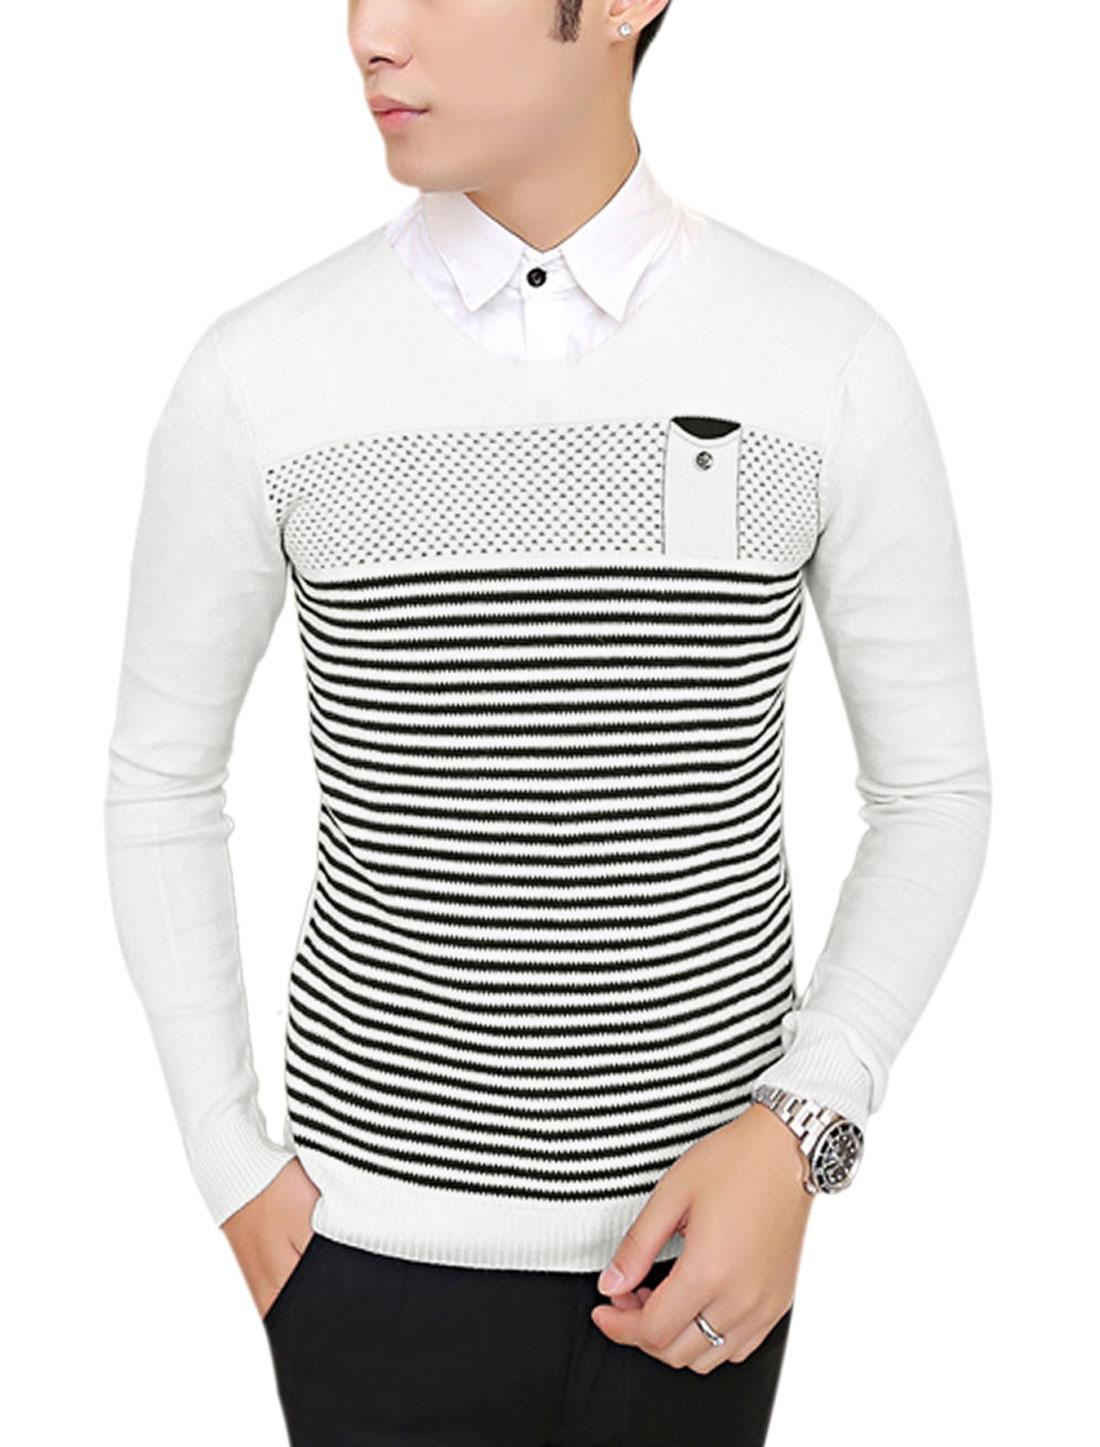 Men V Neck Stripes One Chest Pocket Ribbed Hem Casual Knit Shirt White S